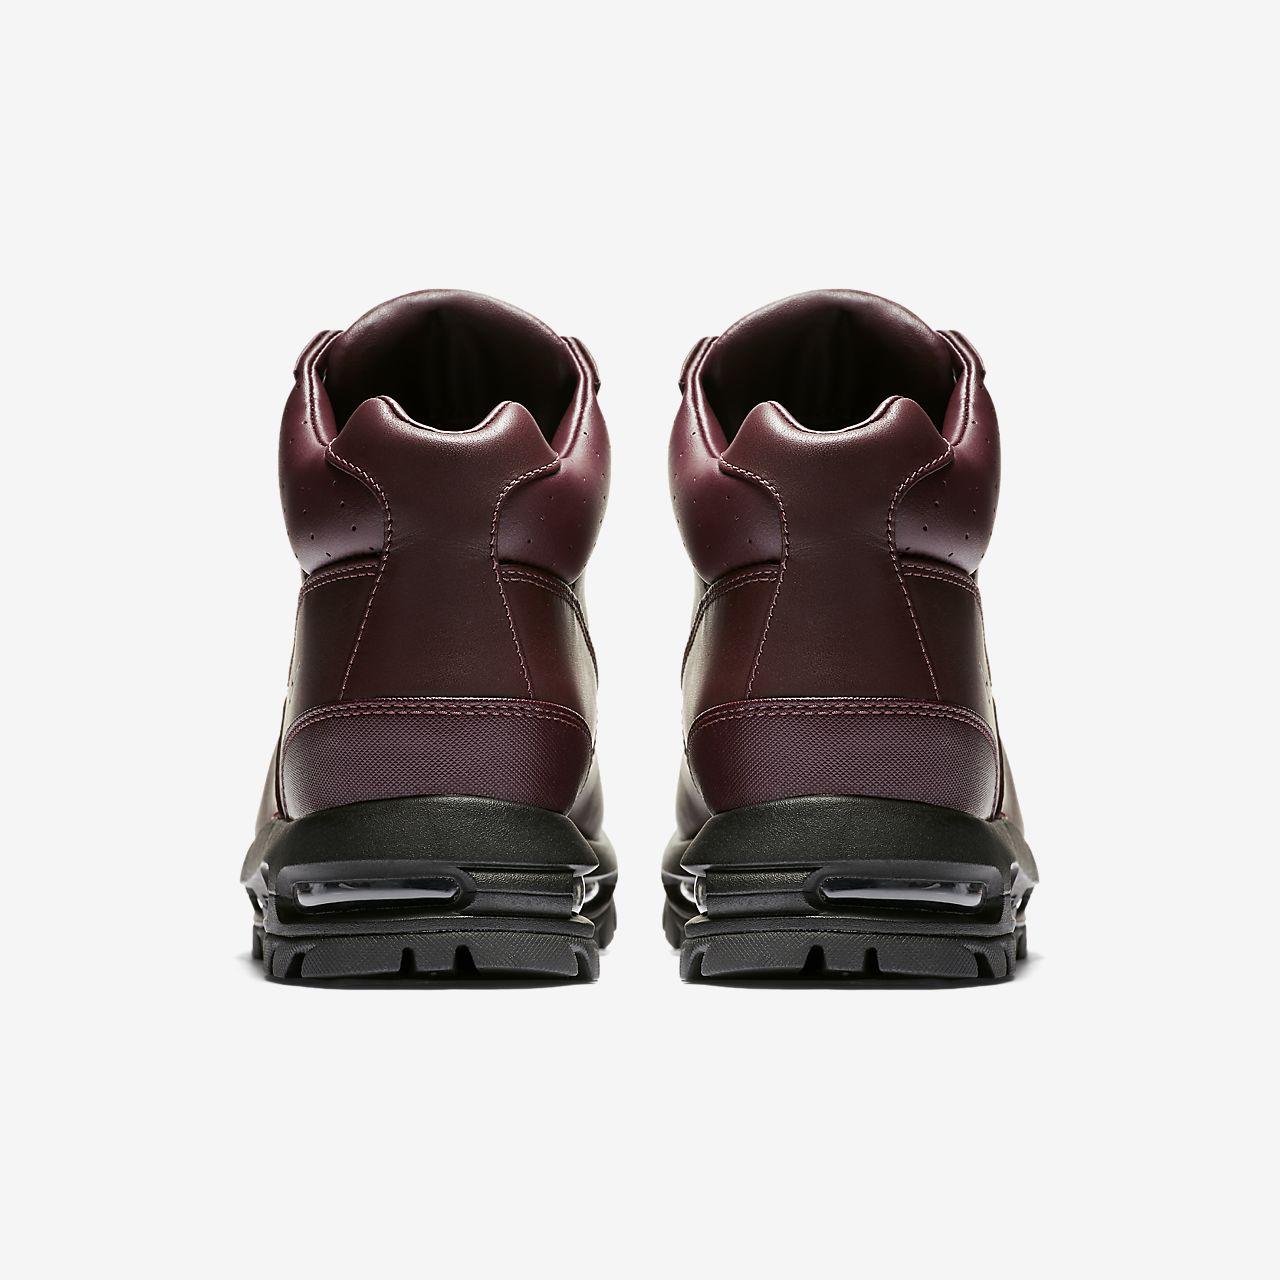 buy online fd778 604f0 Nike Air Max Goadome Mens Boot ...